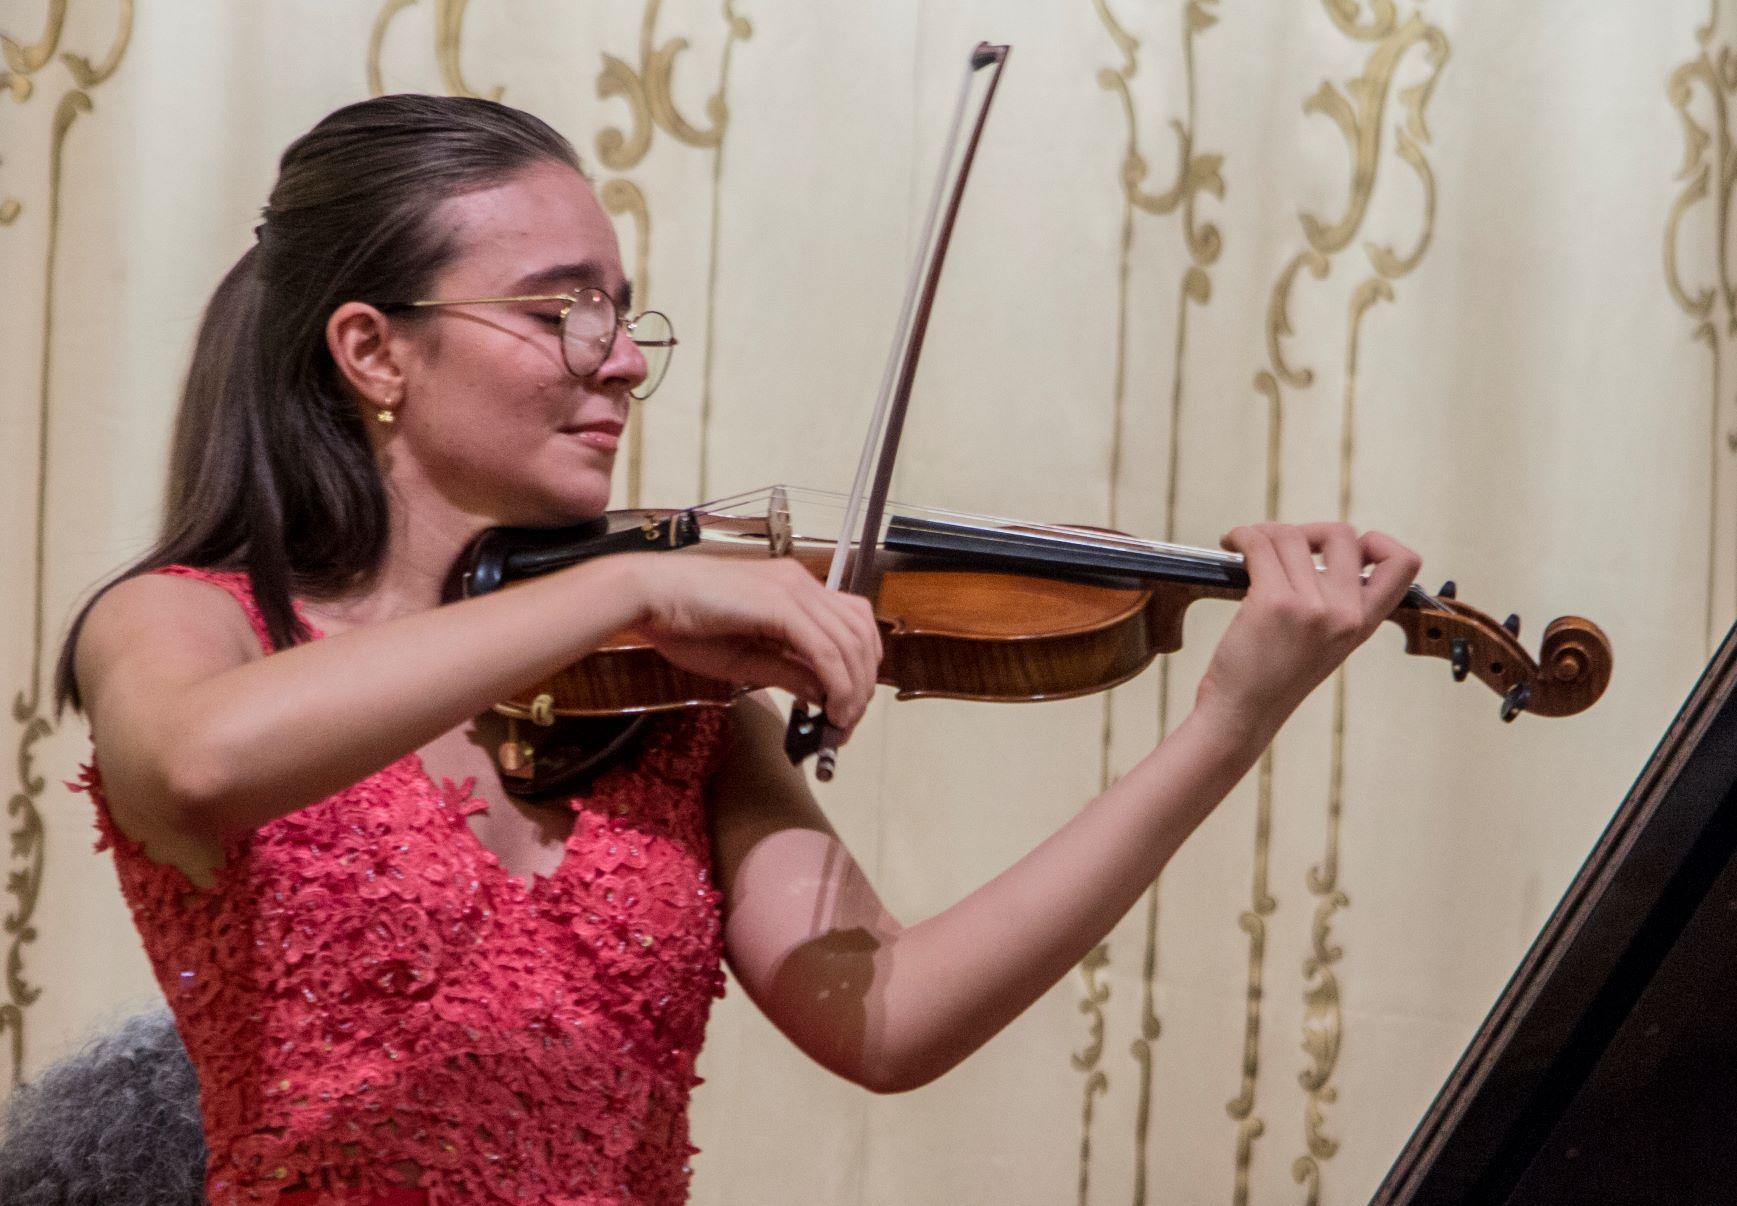 Borsista violino Chigiana 2